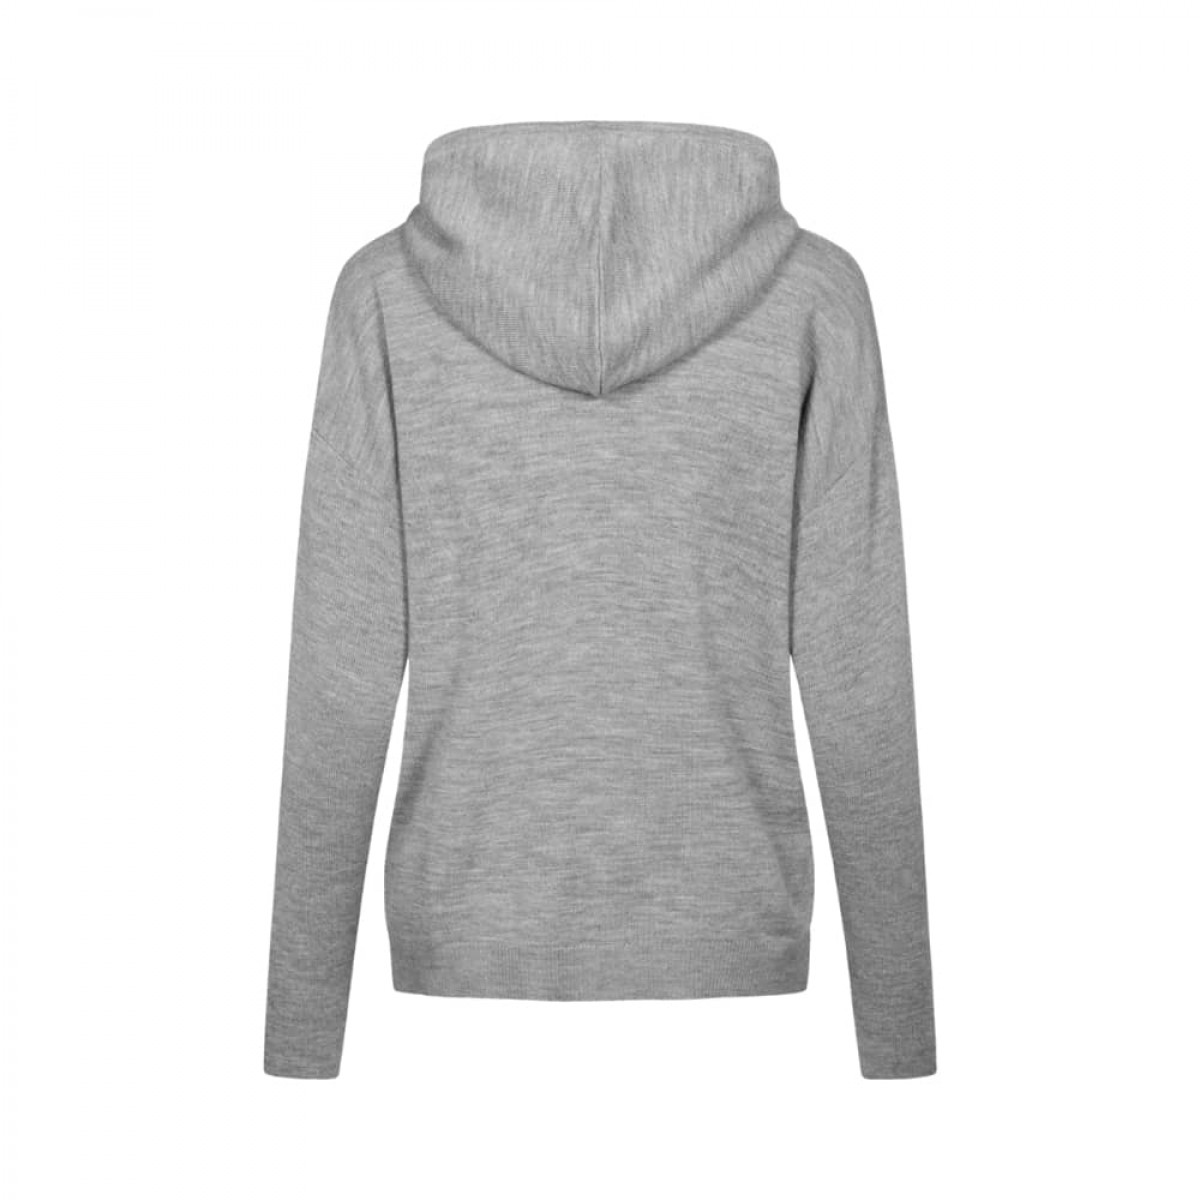 jenna merino hoodie - grey melange - bag